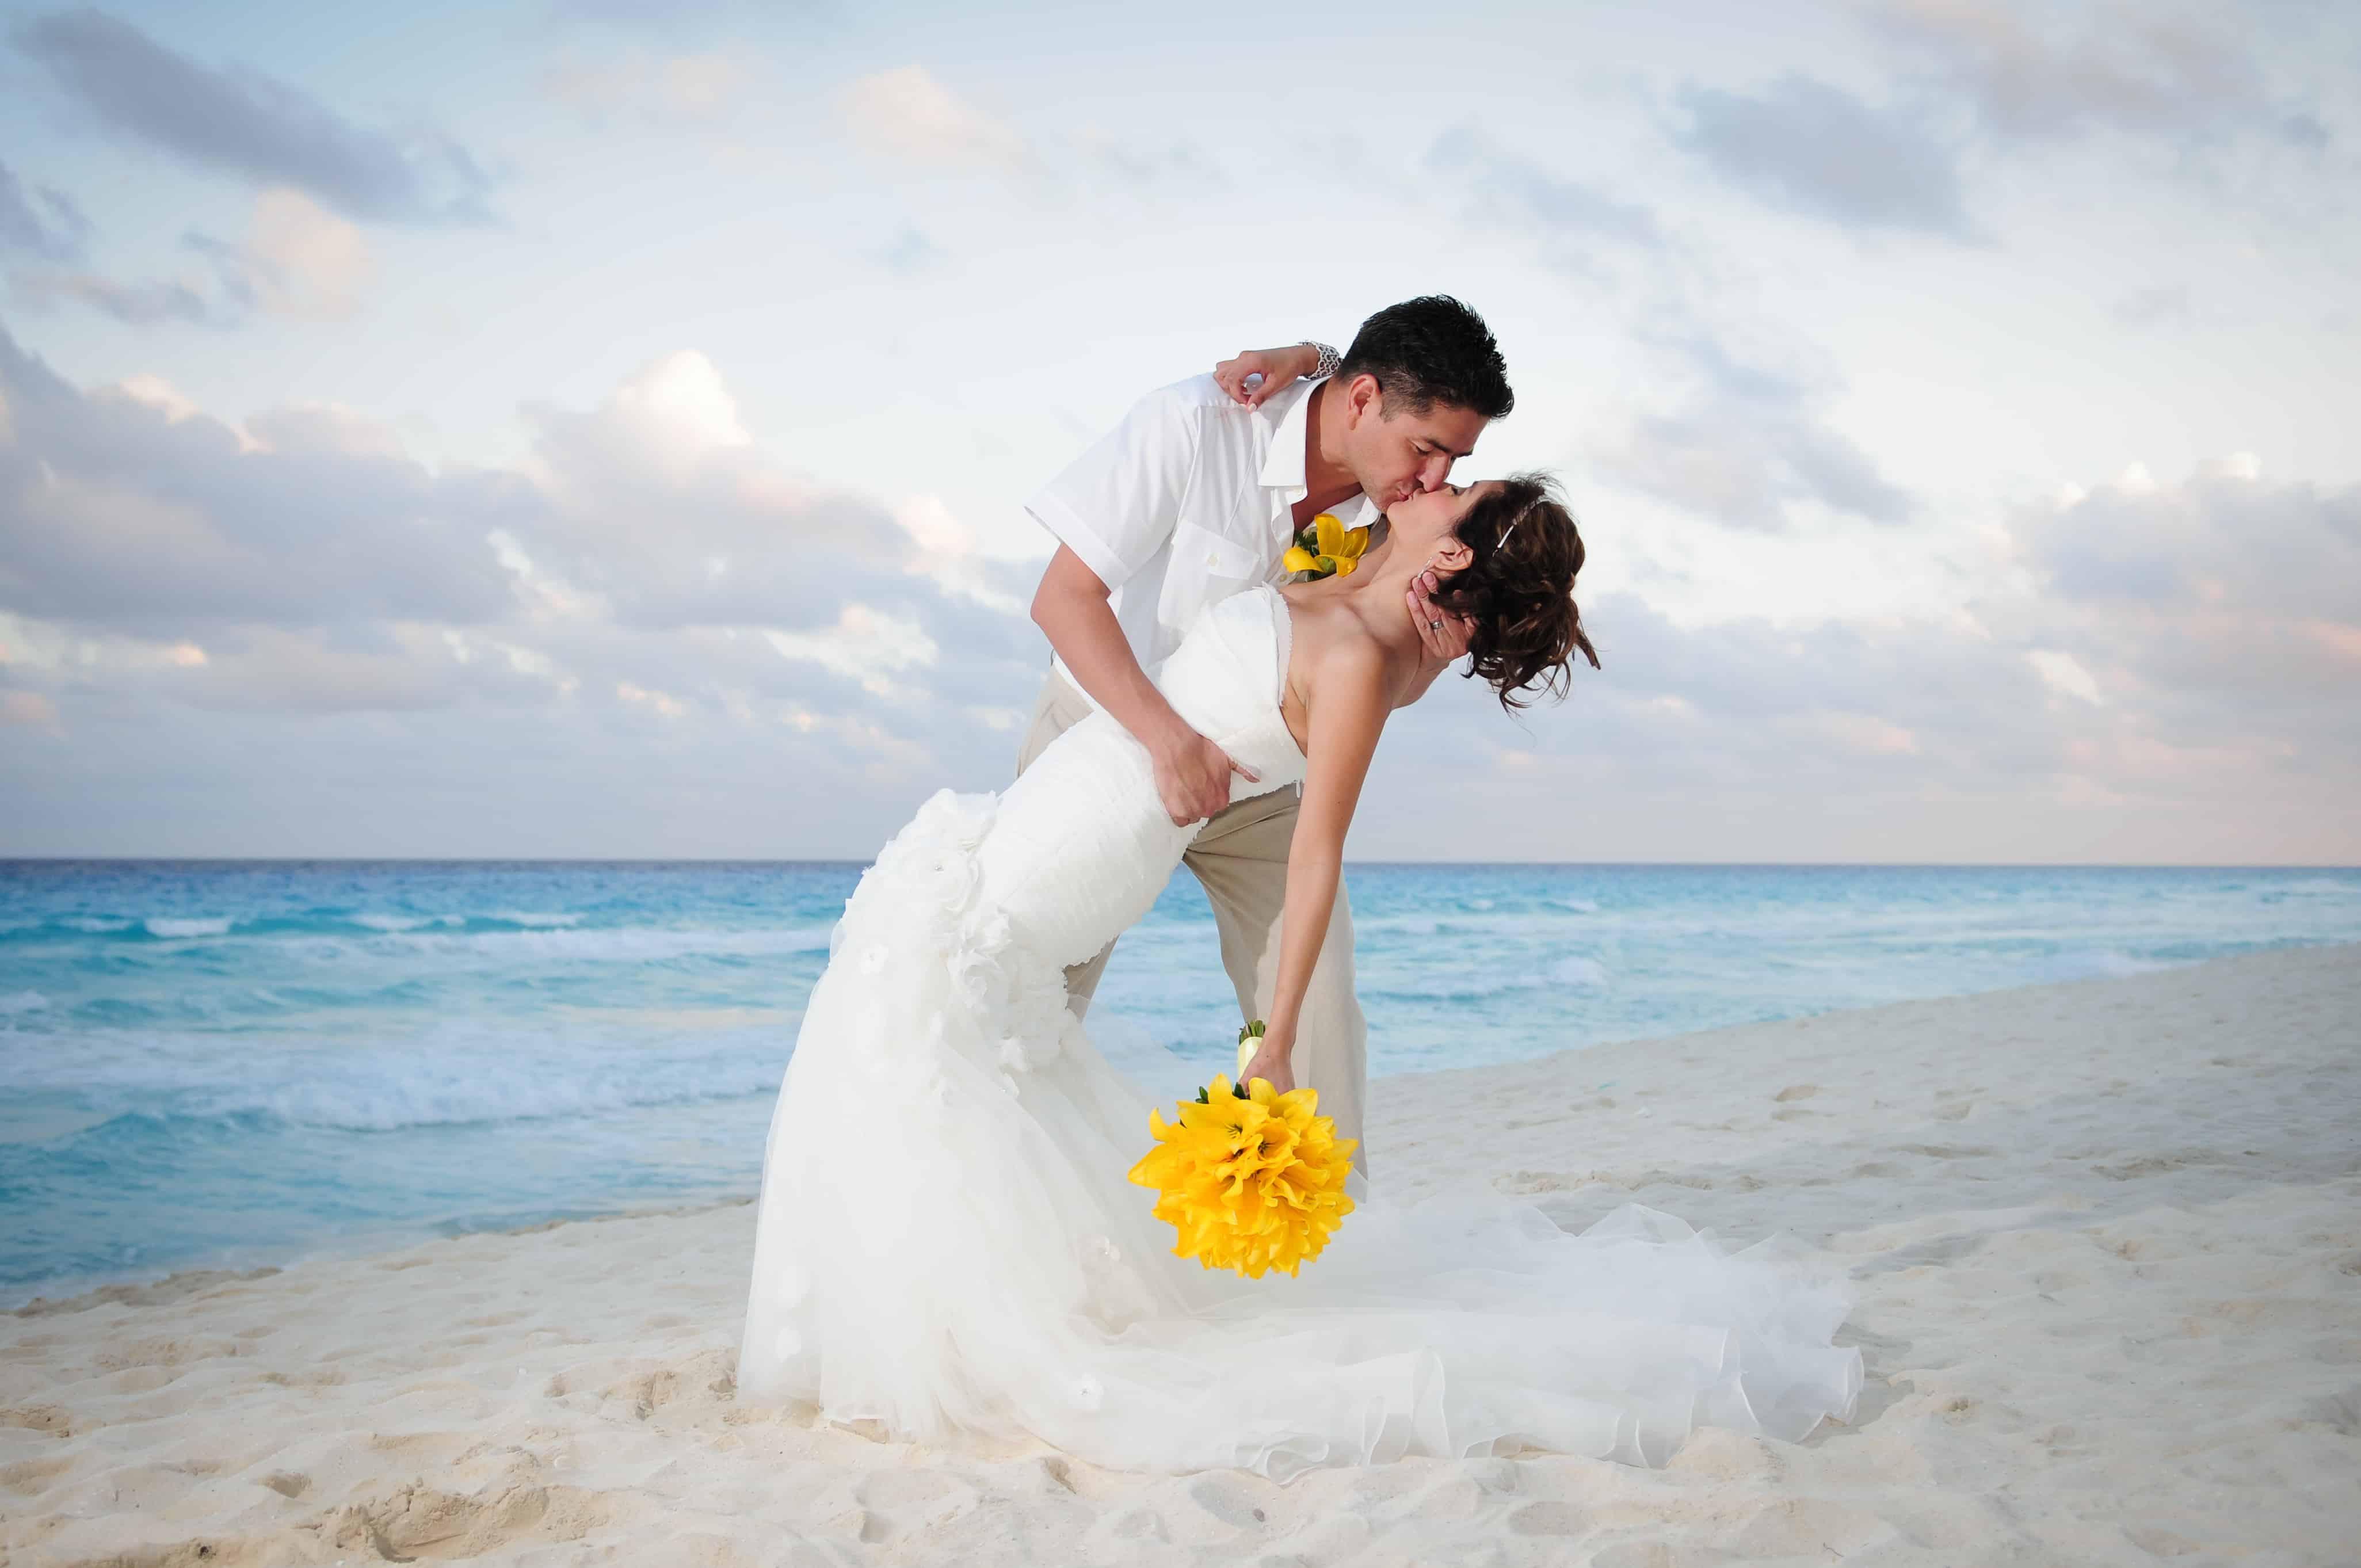 Beach palace cancun wedding photos Barcel Maya Palace Resorts in Mexico m